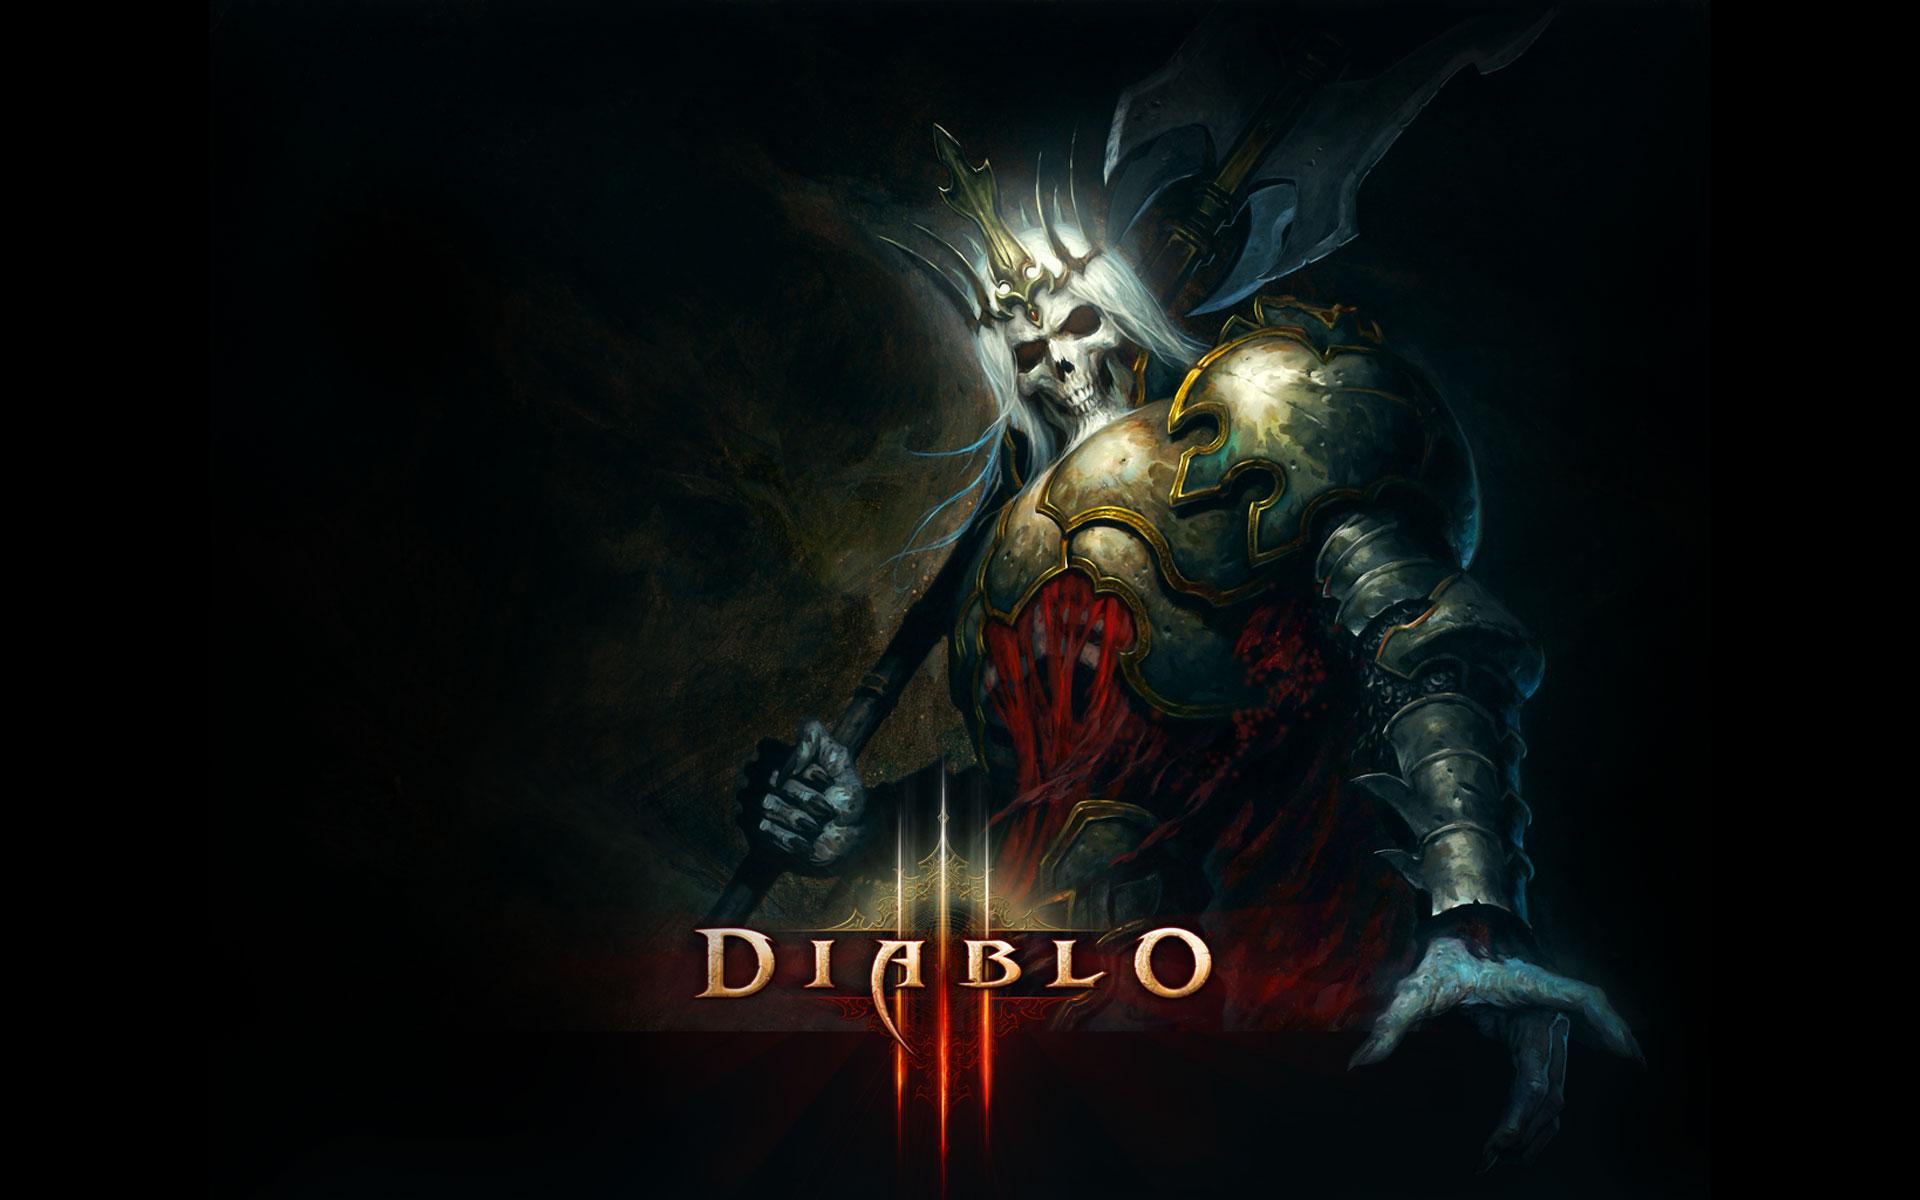 Diablo 3 Ros Wallpaper: Diablo 3 Wallpaper 1920x1080